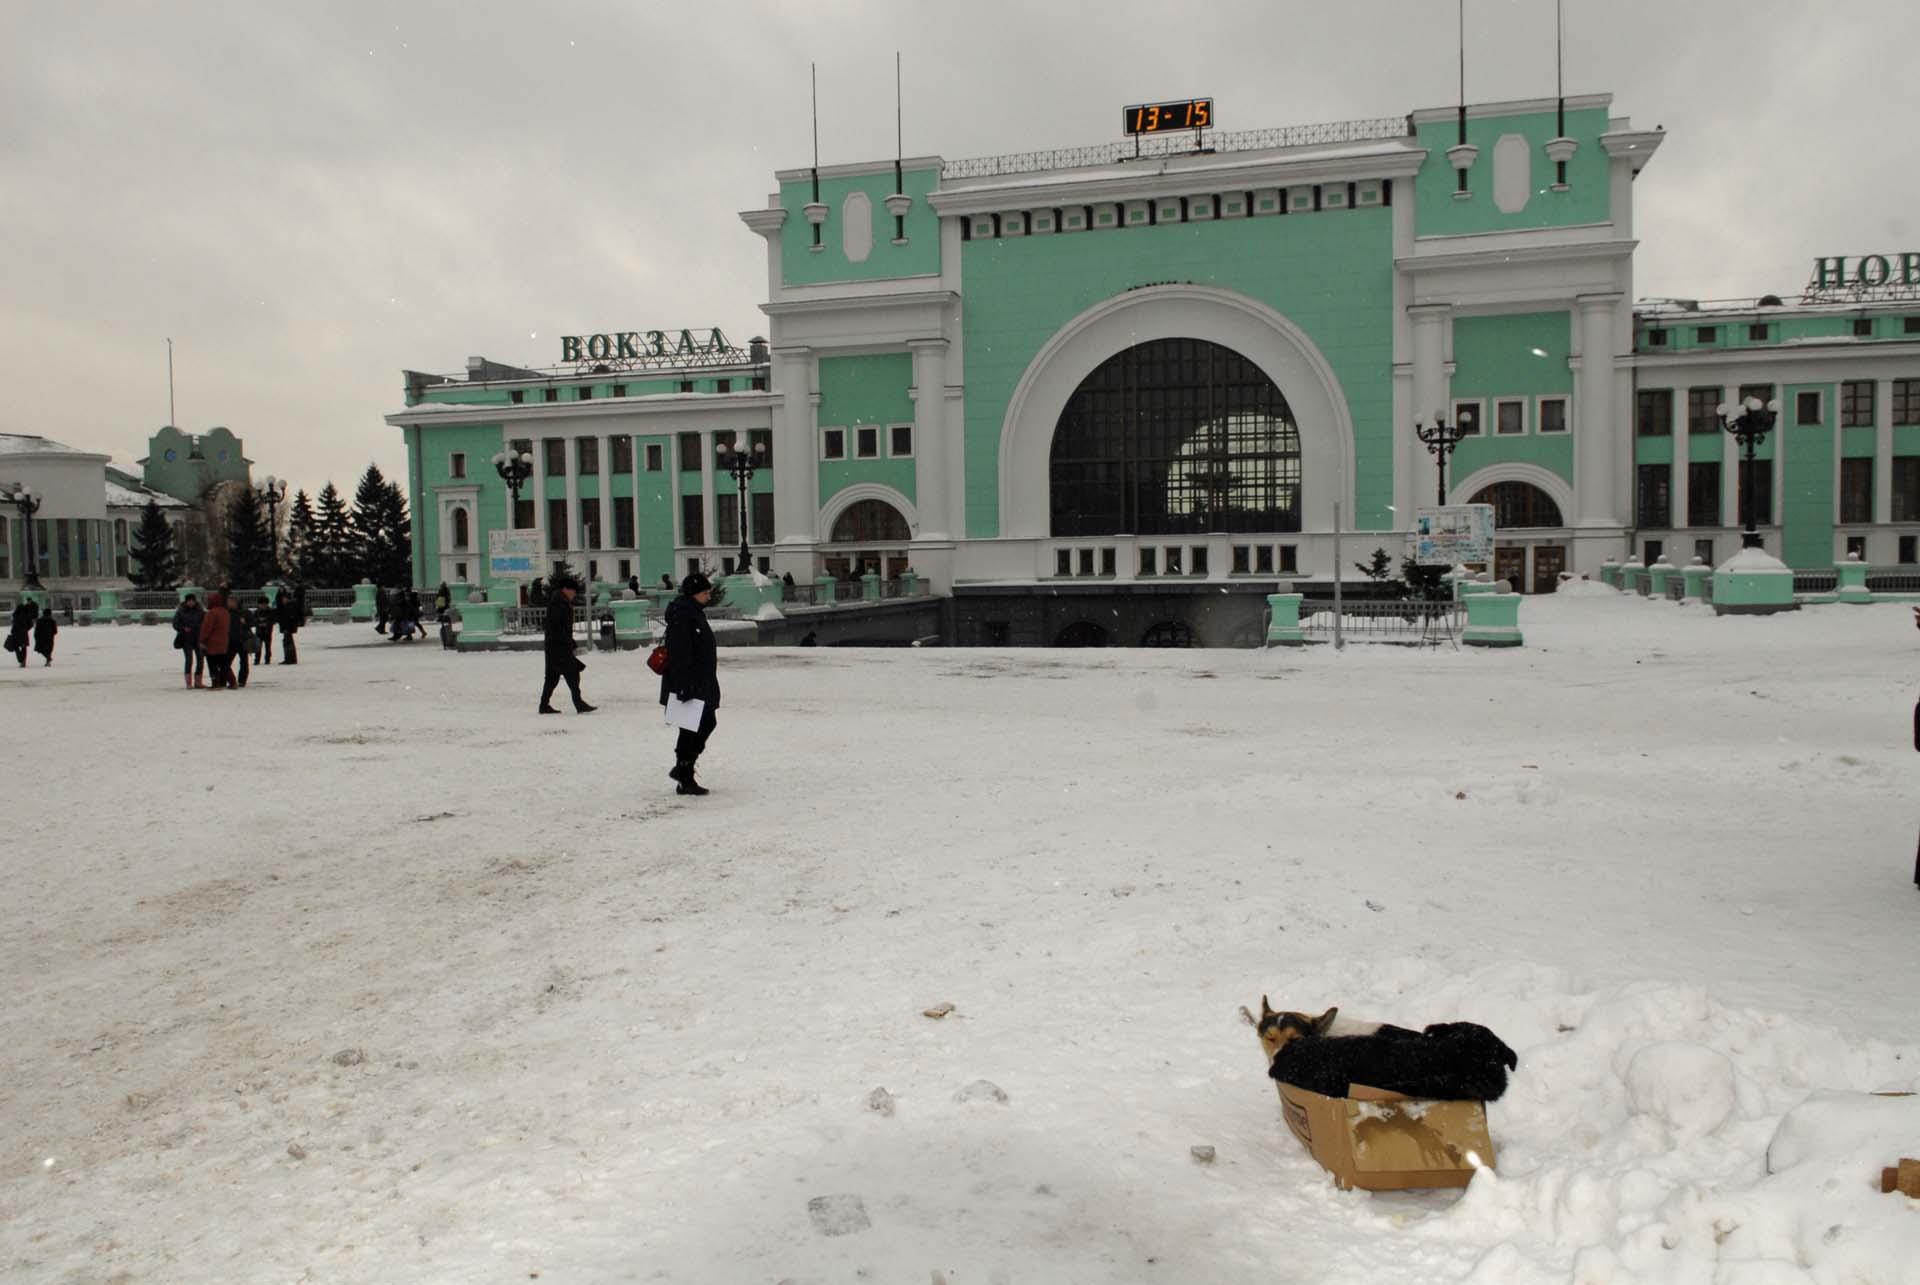 Bahnhofsvorplatz Novosibirsk